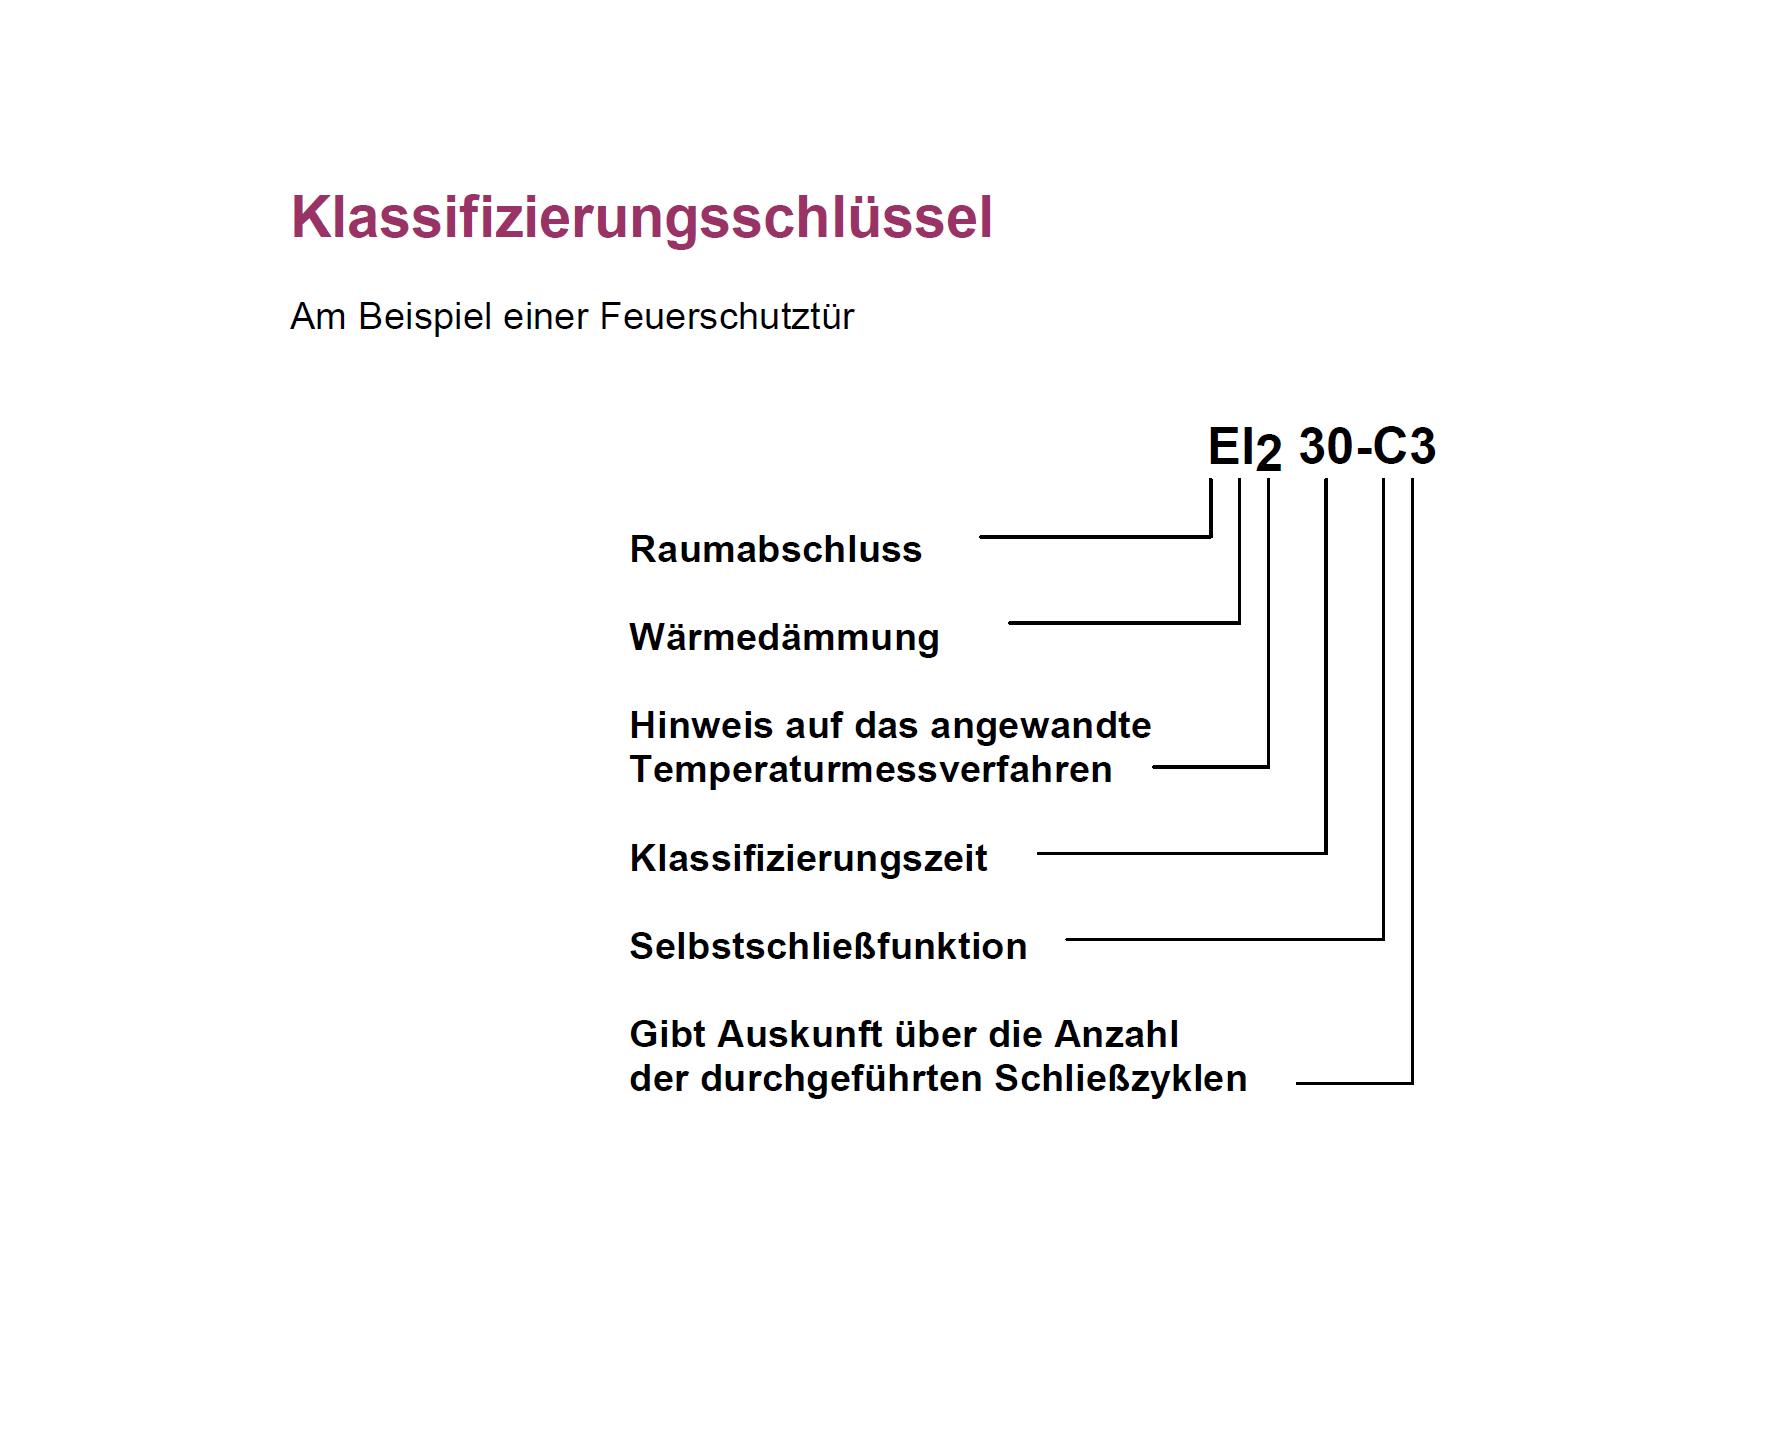 Klassifizierungsschluessel-Brandschutz-Weissmann